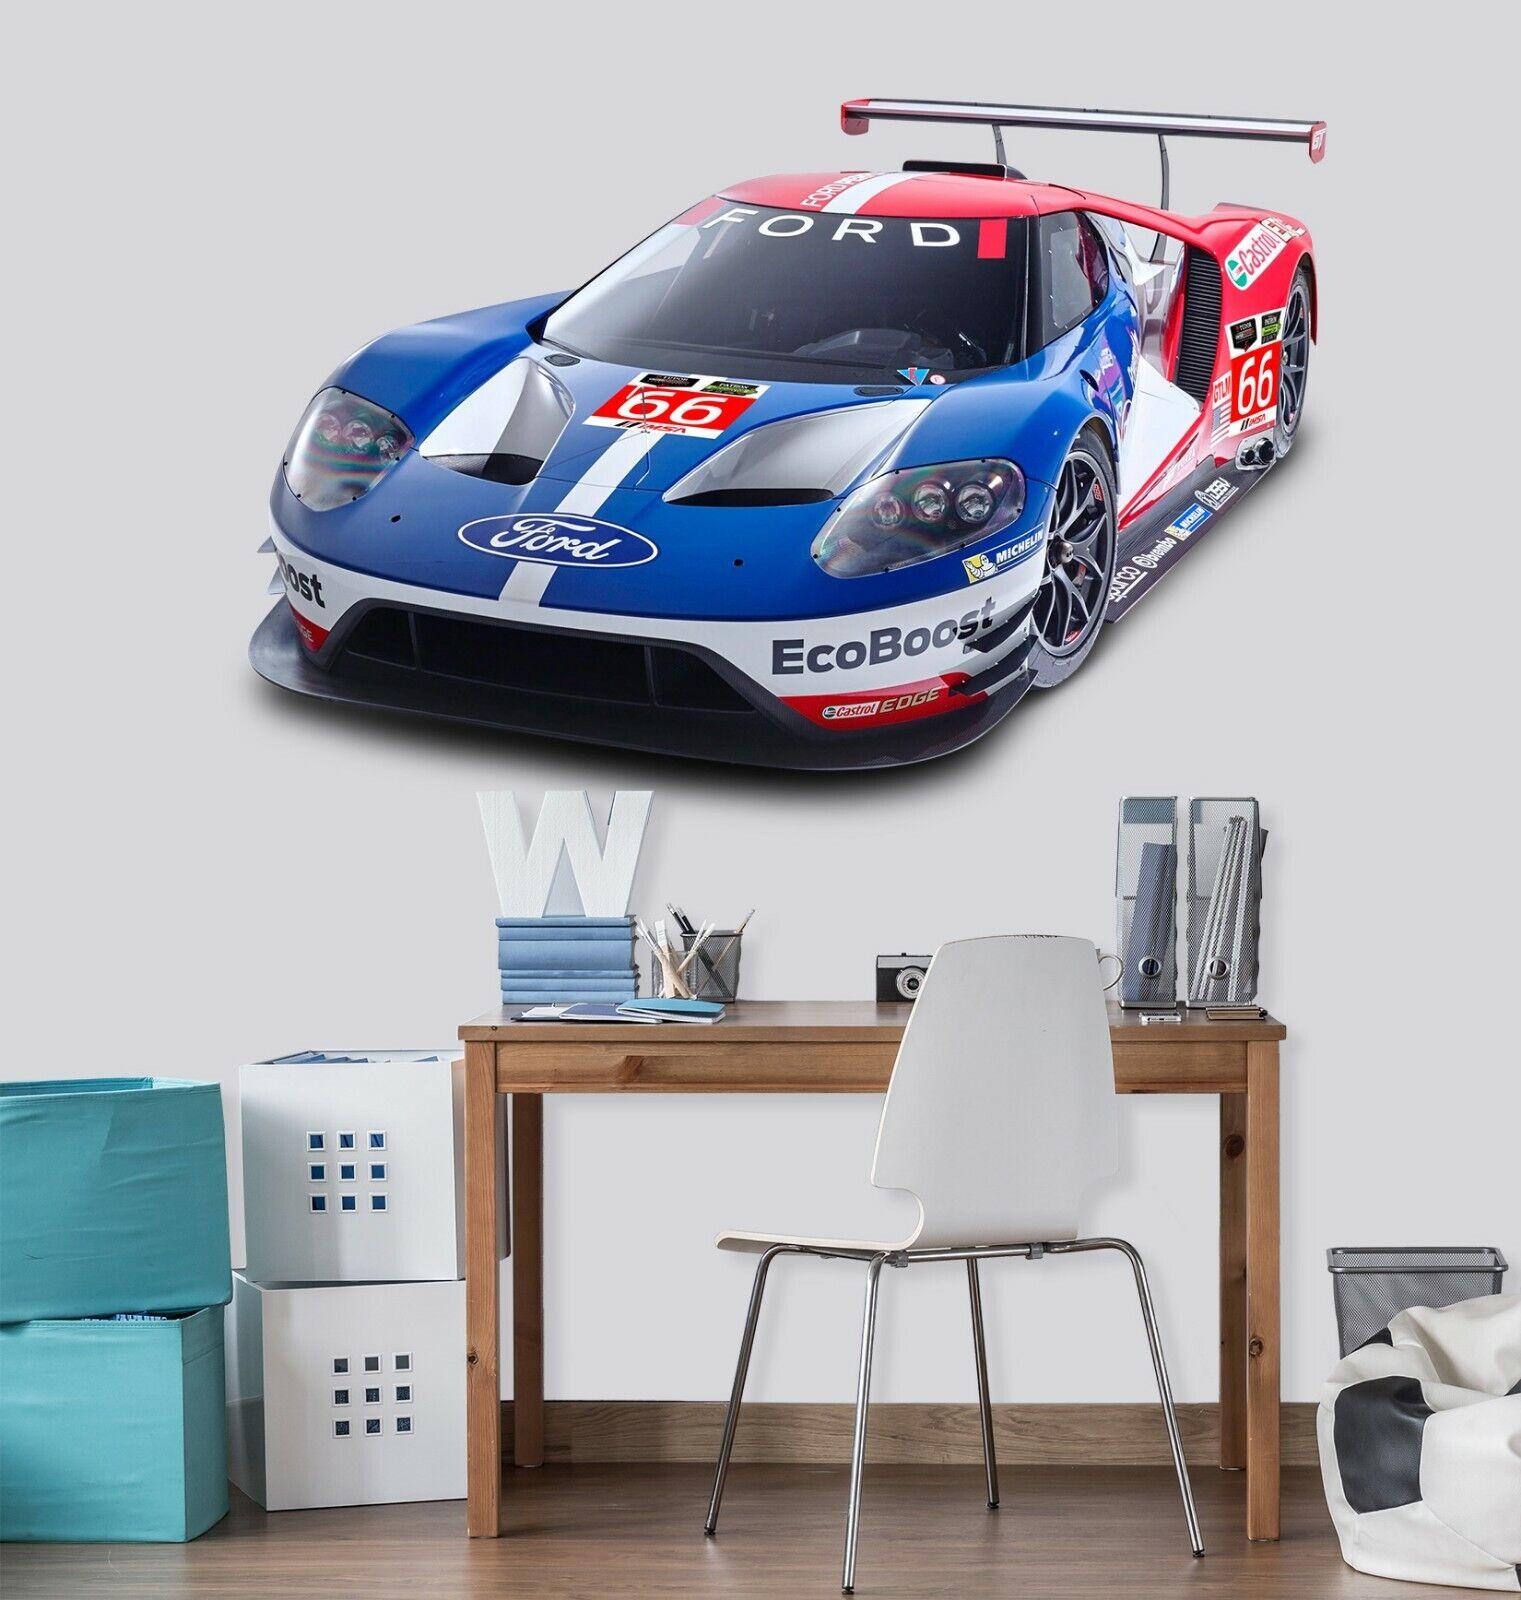 3D Blau Racing Car A223 Car Wallpaper Mural Poster Transport Wall Stickers Zoe